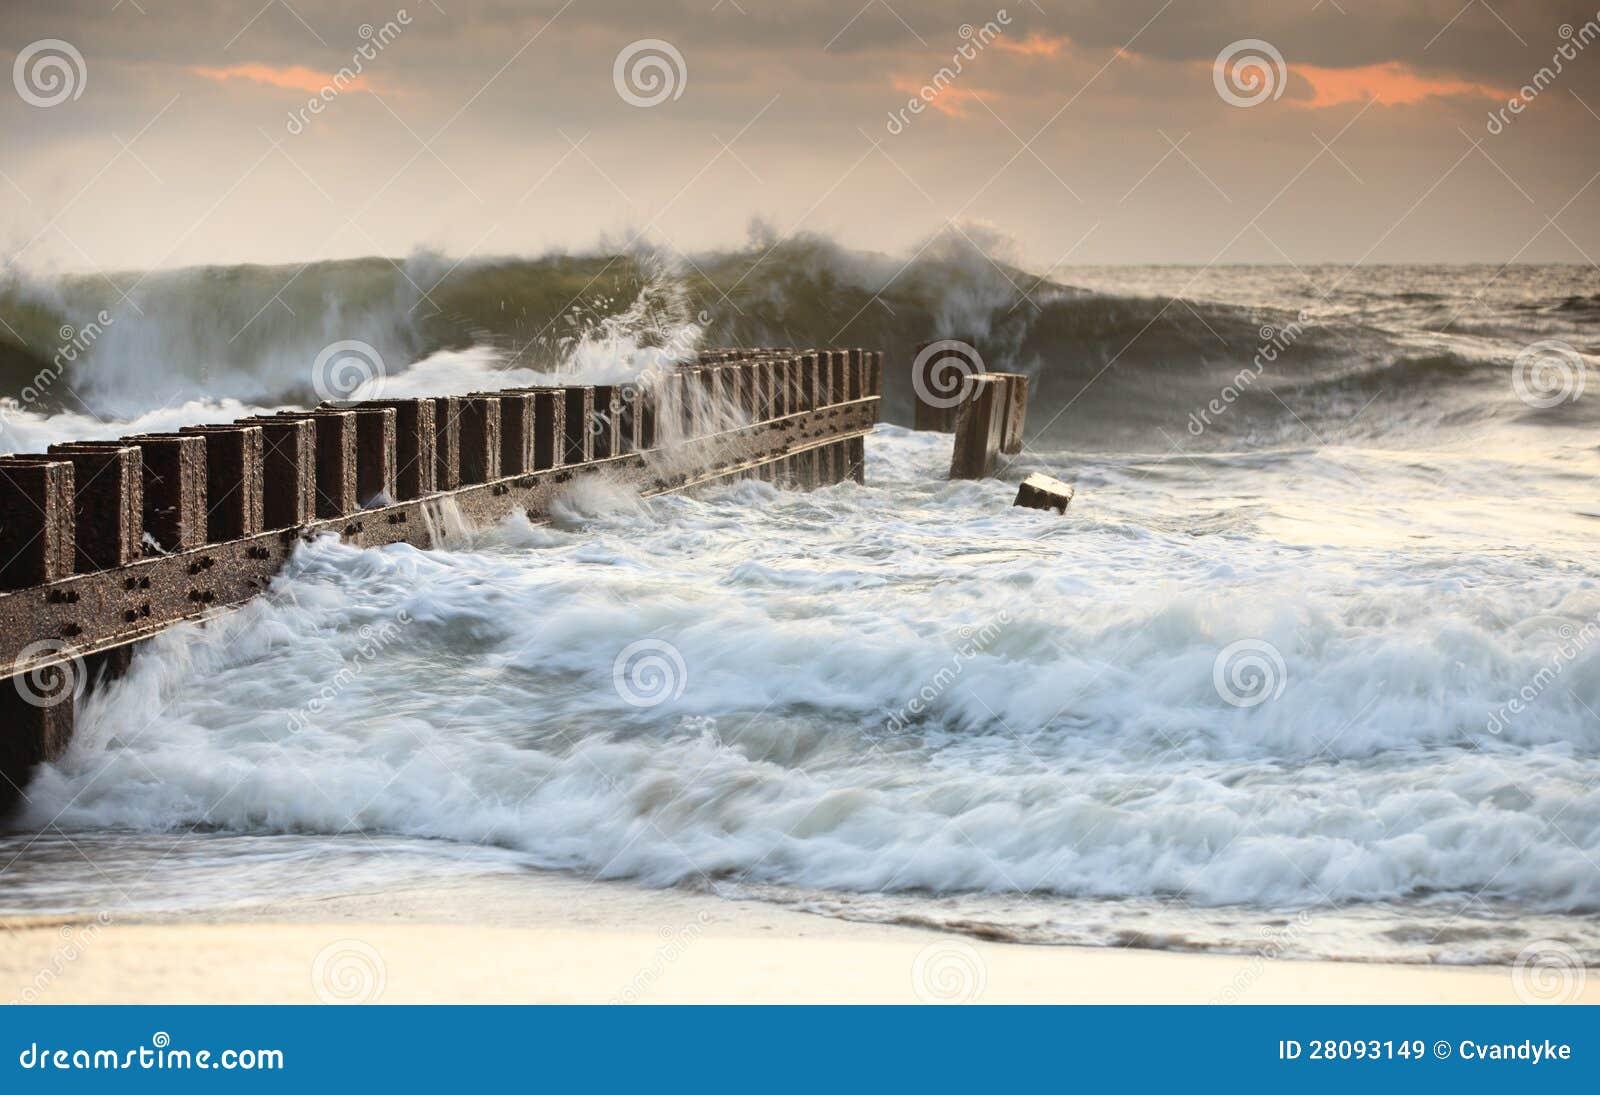 Groyne Bashed By Ocean Waves North Carolina Stock Image